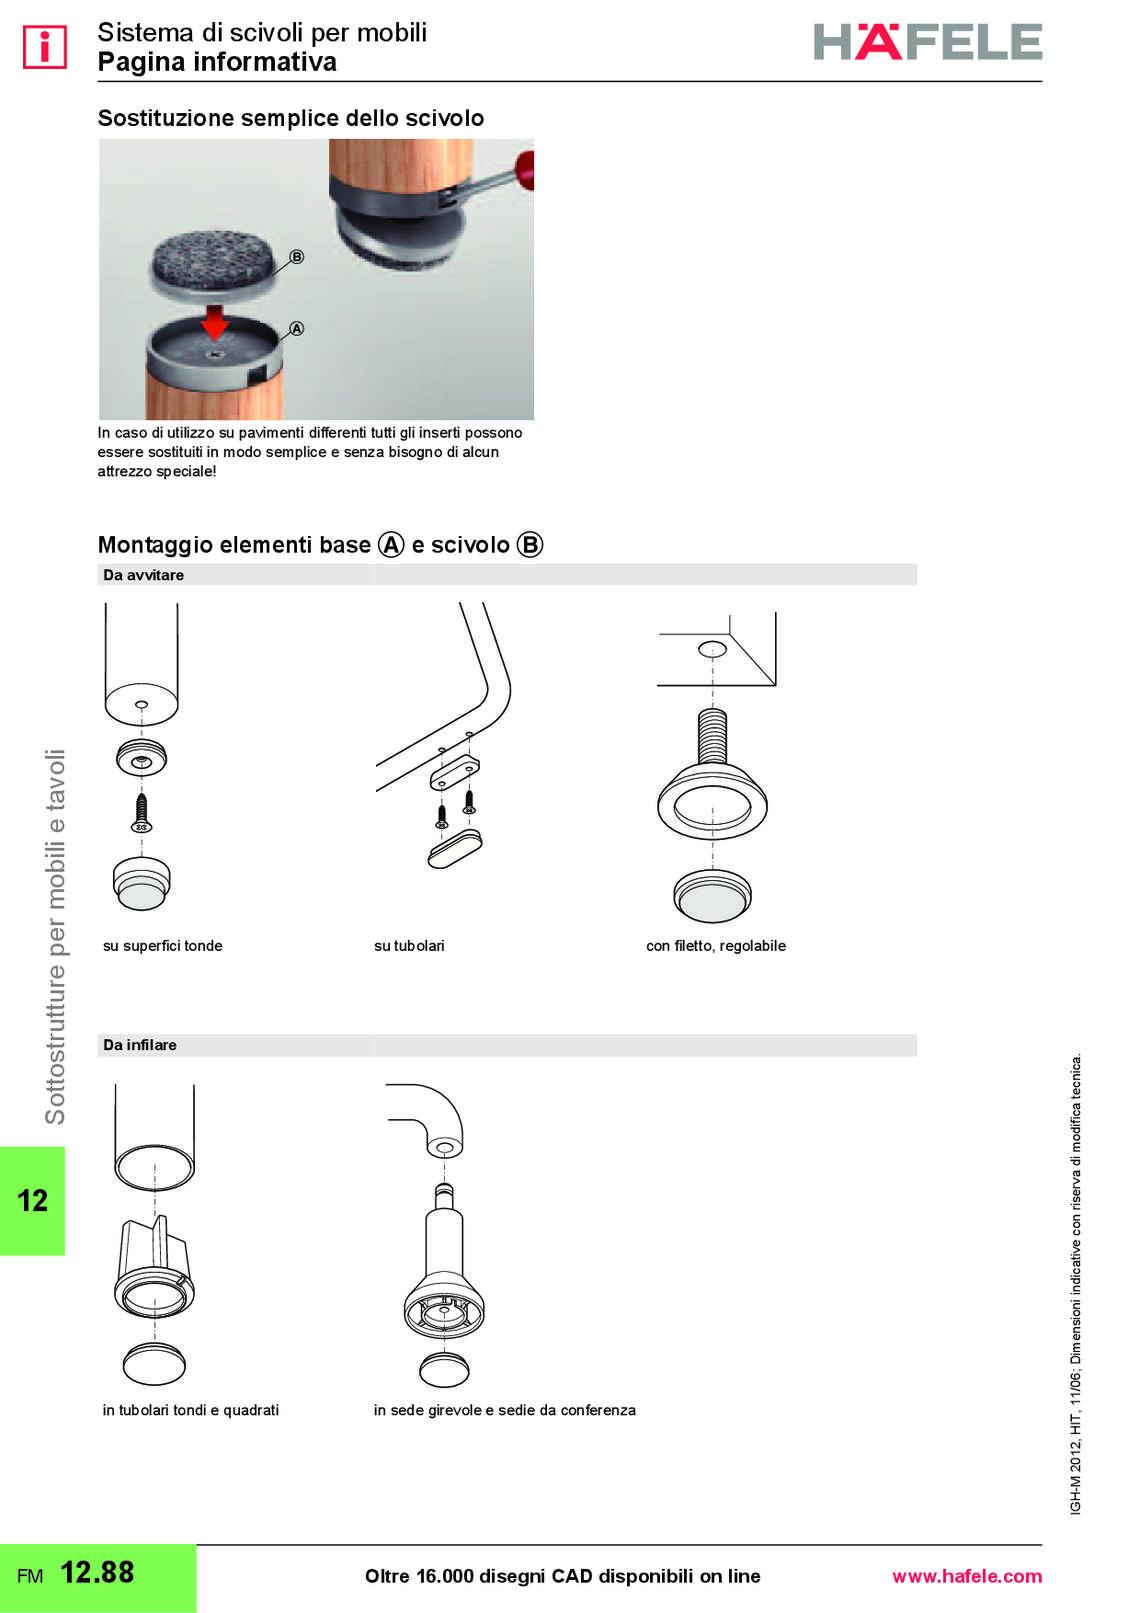 hafele-sottostrutture-per-mobili_83_113.jpg